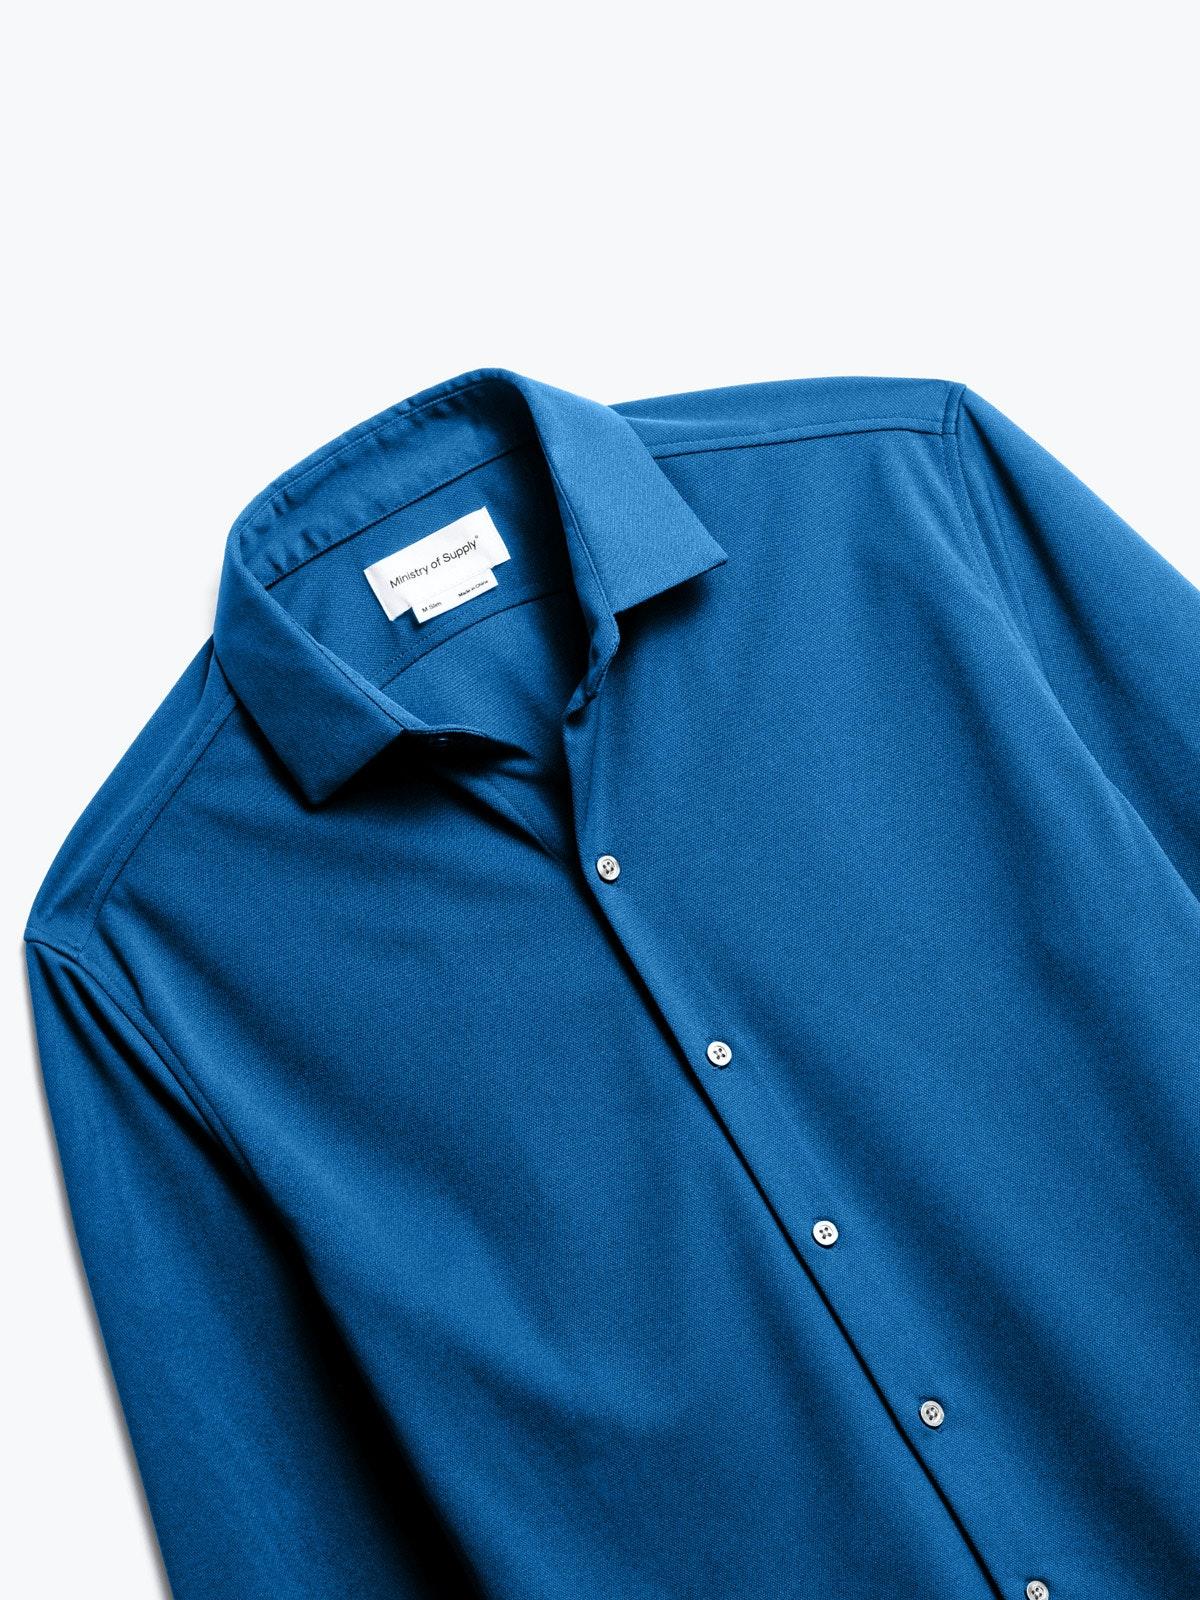 Optic Waves Short Sleeve Dress Shirt